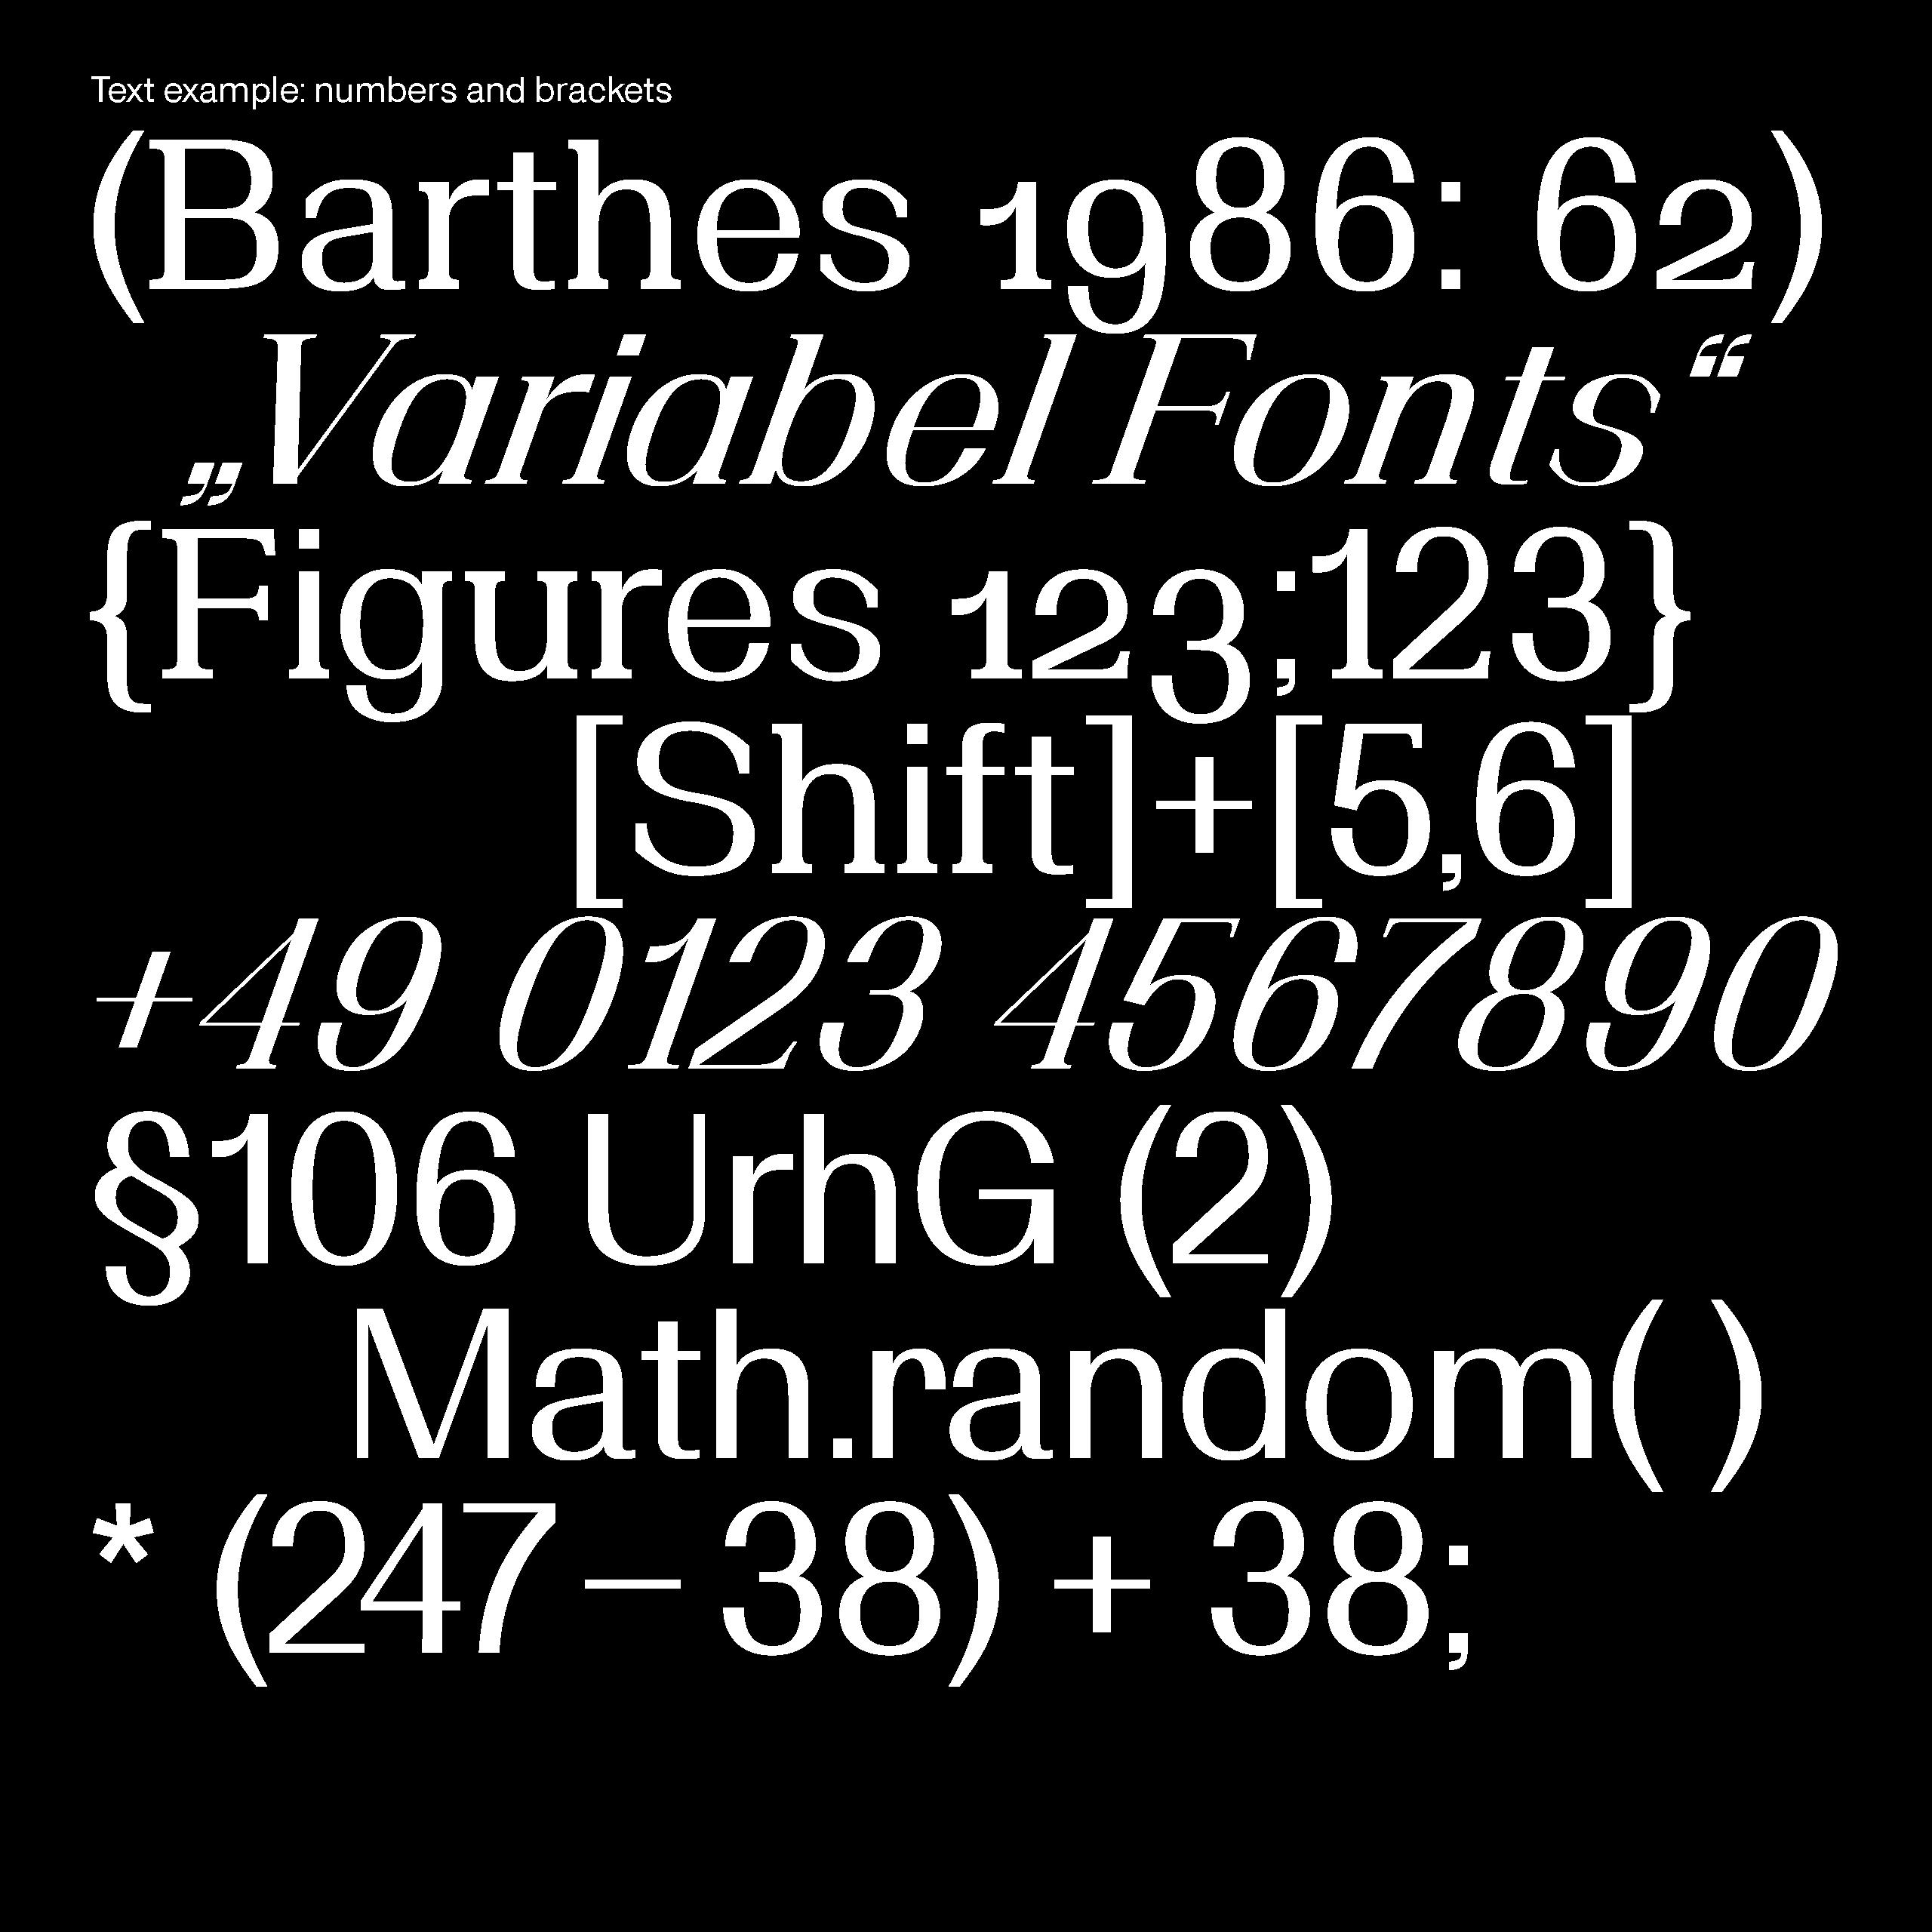 Daniel_Stuhlpfarrer_Spekulative-Schriftgestaltung-Speculative-Type-Design_WEB15